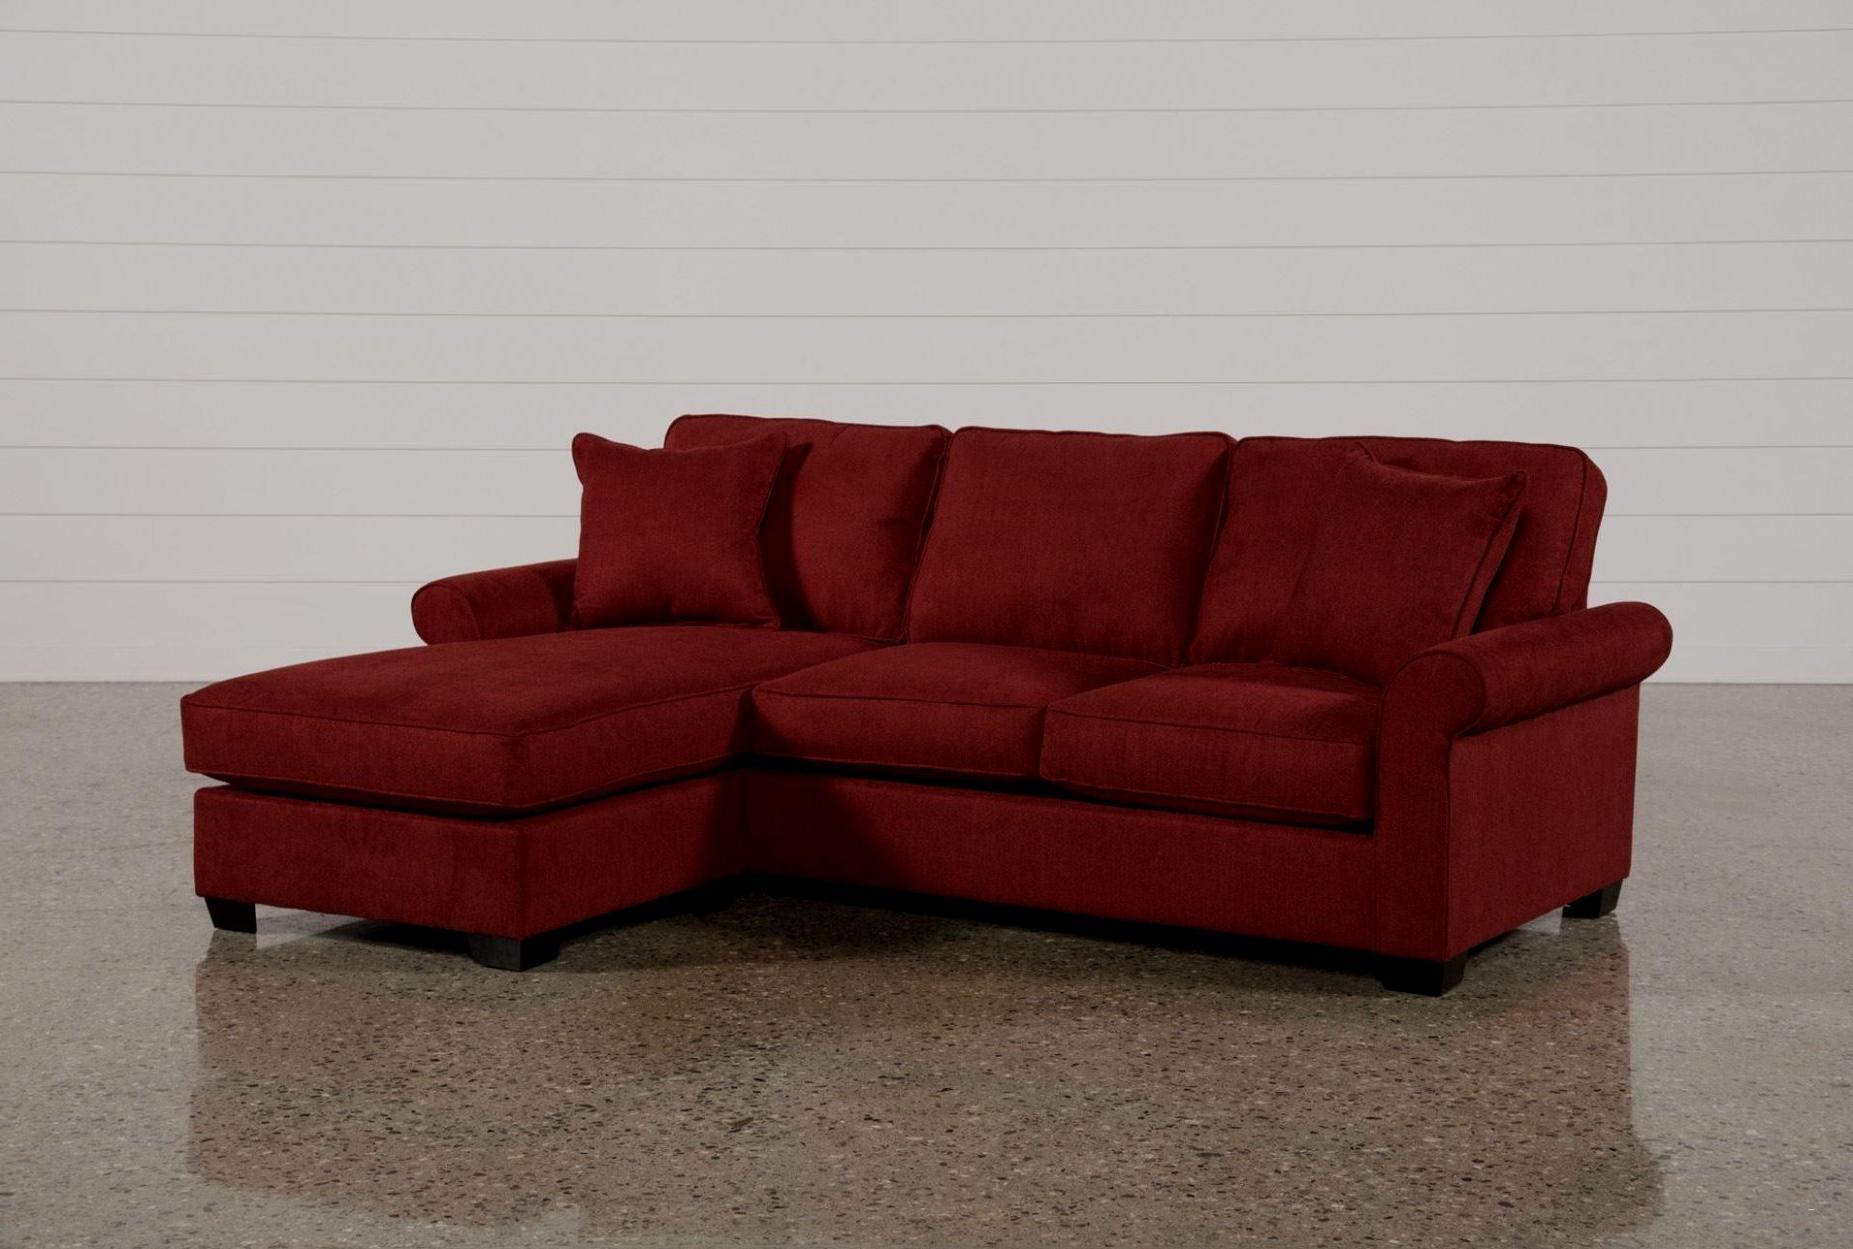 Sofa Cama Bueno S5d8 25 Encantador sofa Cama Bueno Busco Sillas